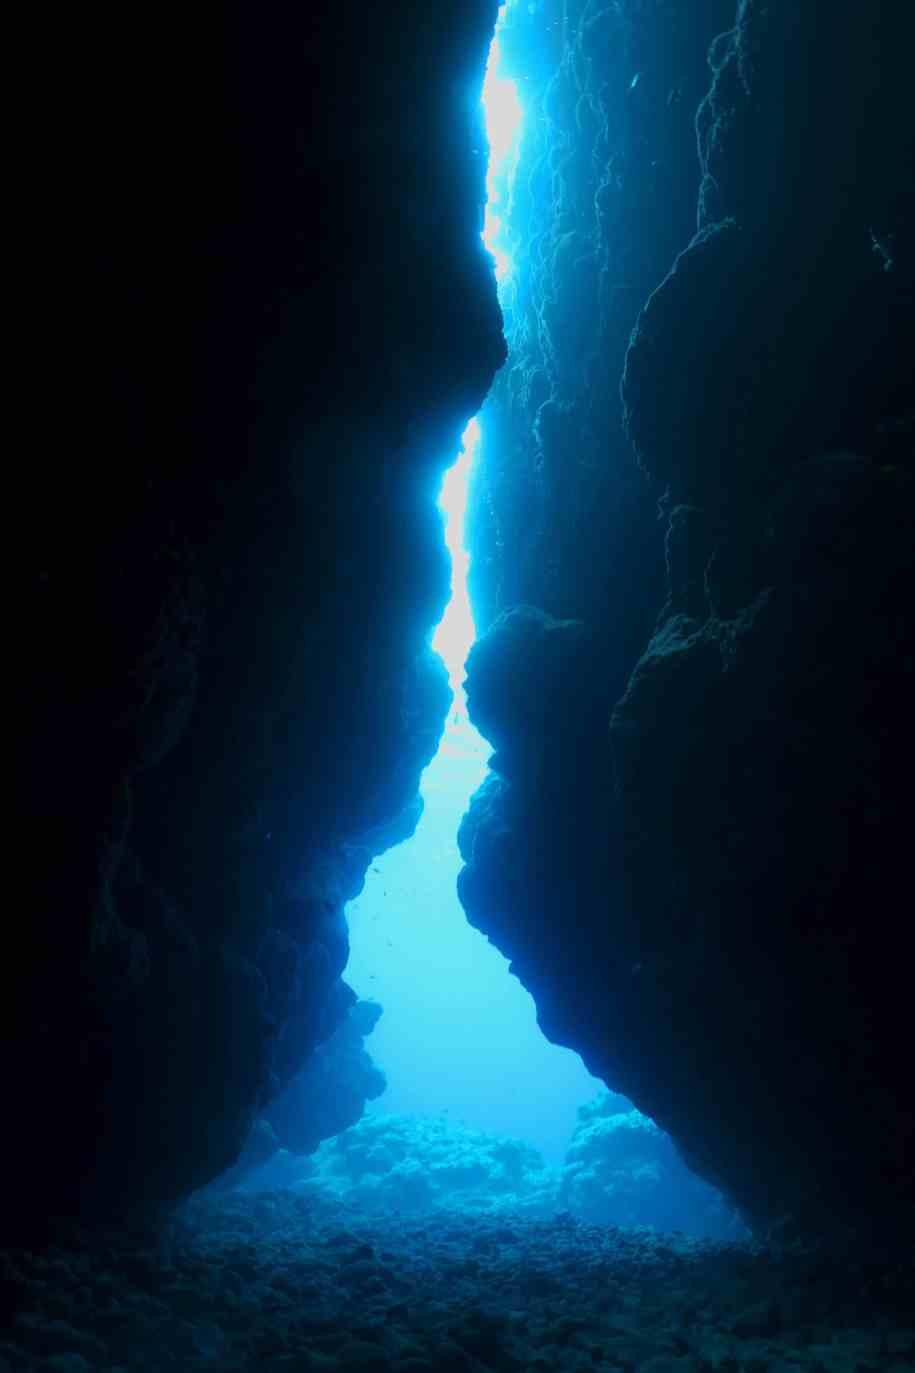 Nakamoto Cave Scuba diving Kuroshima Ishigaki Okinawa Japan